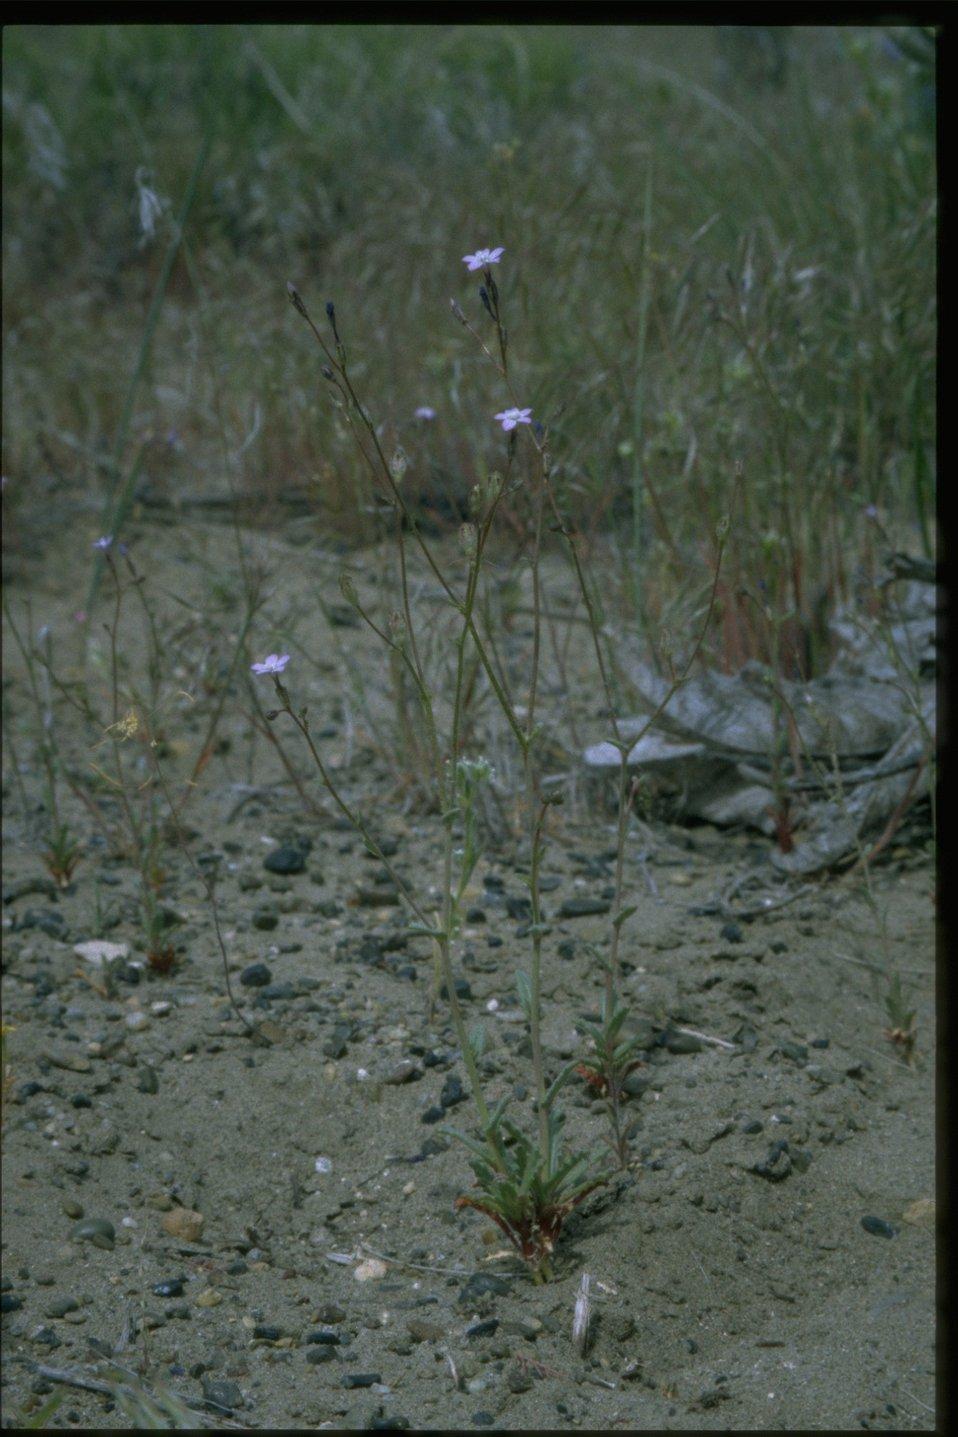 Farshot of Phacelia habitat.